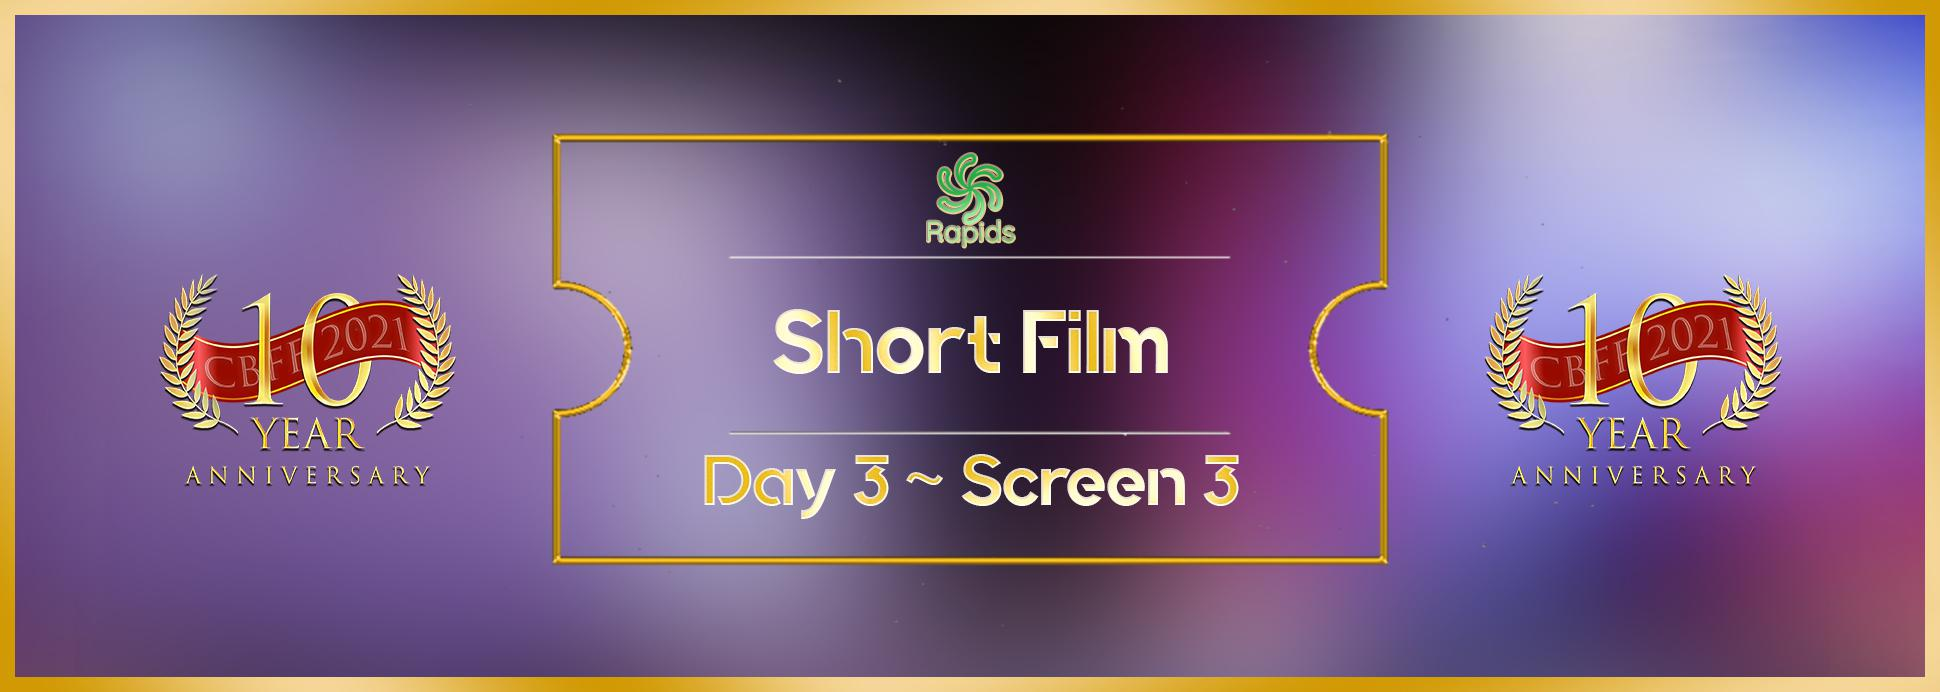 Day 3, Screen 3: Short Film